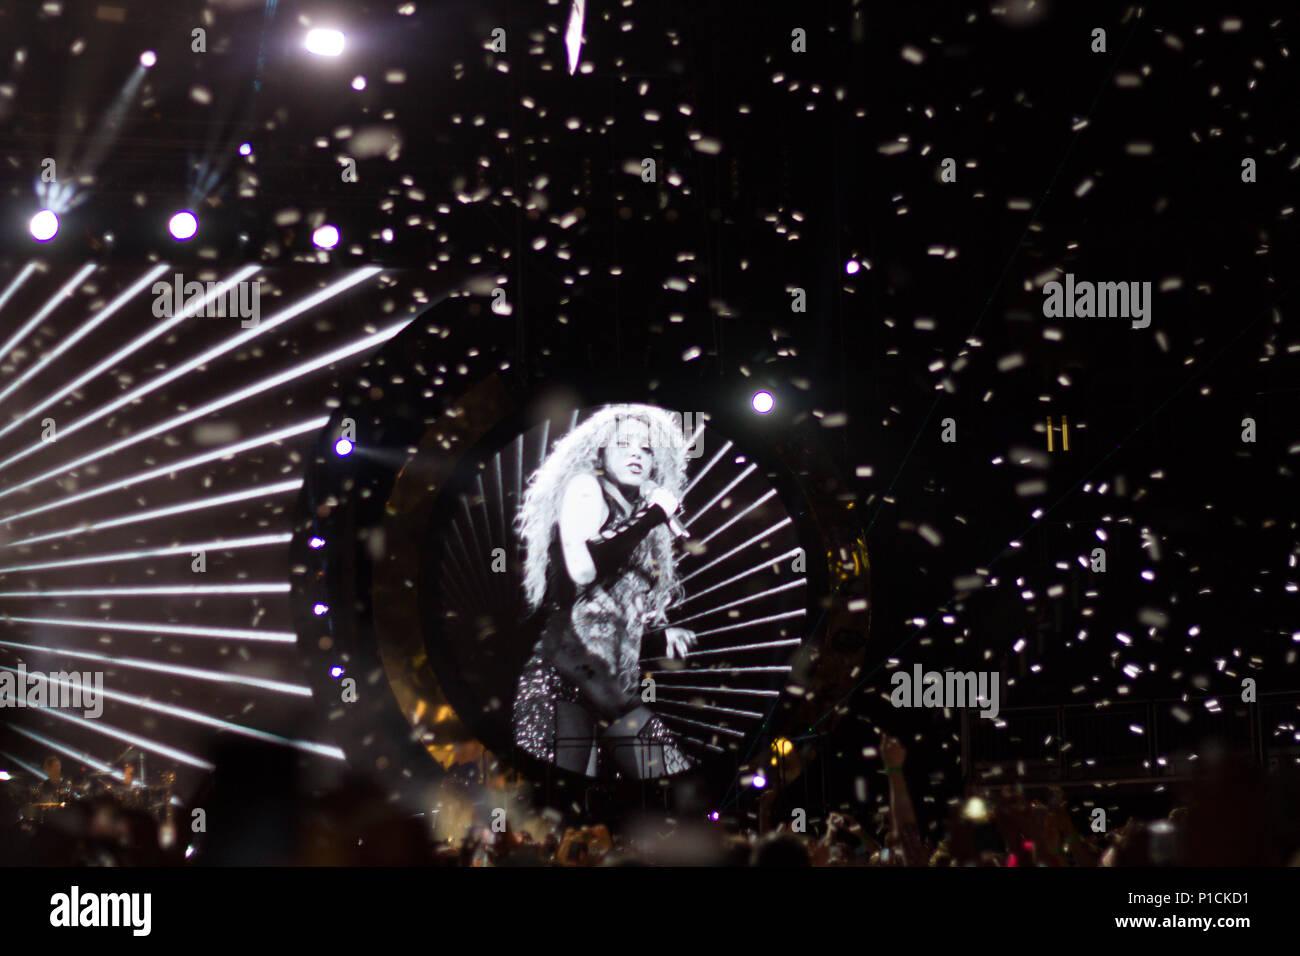 London, United Kingdom. 11 June, 2018.Shakira performs in London, United Kingdom. Credit: Brayan Lopez/Alamy Live News. Stock Photo